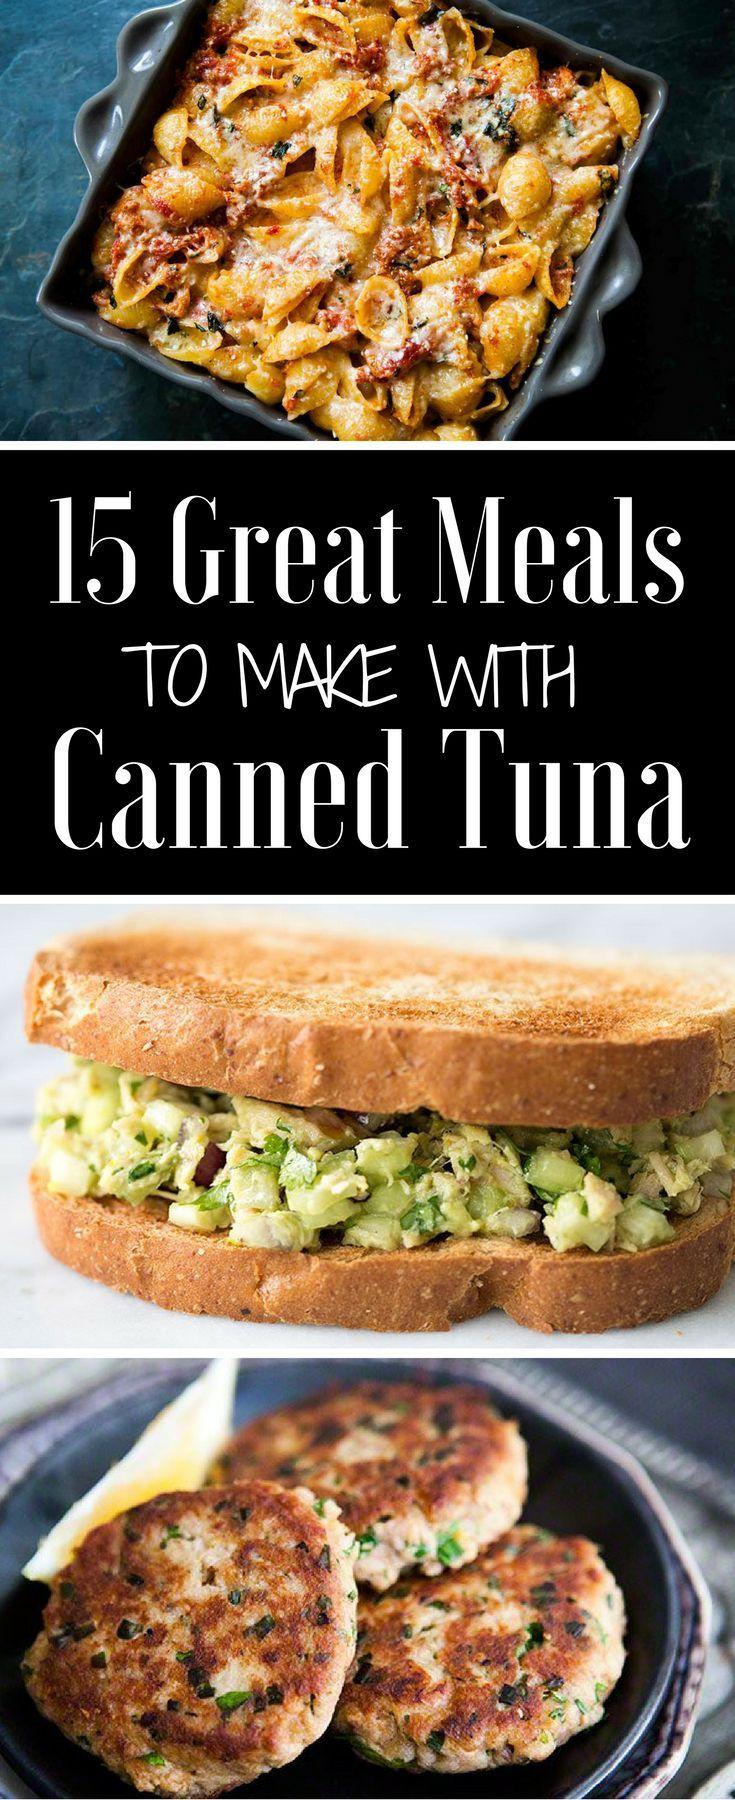 15 awesome recipes for canned tuna! Tuna patties, tuna salad, tuna pasta, and more! (Cheap Seafood Recipes)